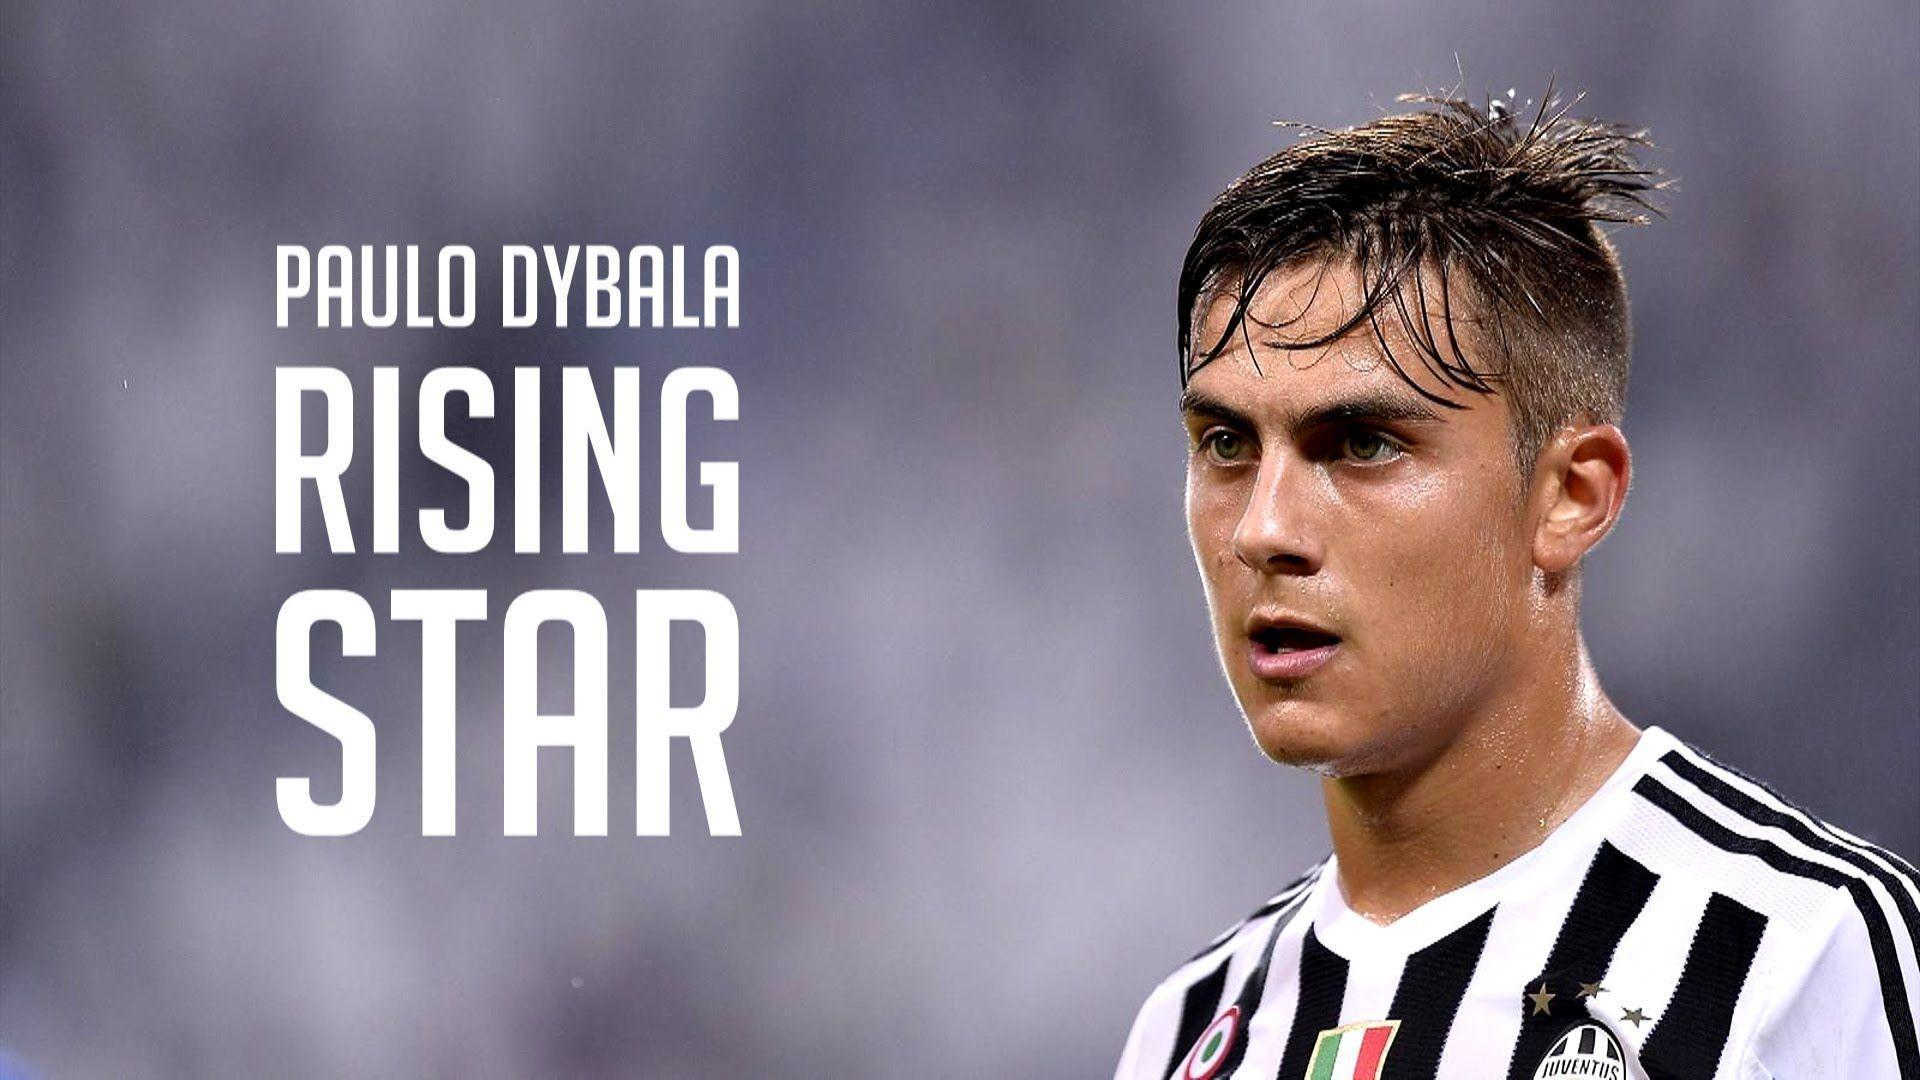 Paulo Dybala Rising Star Juventus Wallpaper #4494 Wallpaper Themes ...